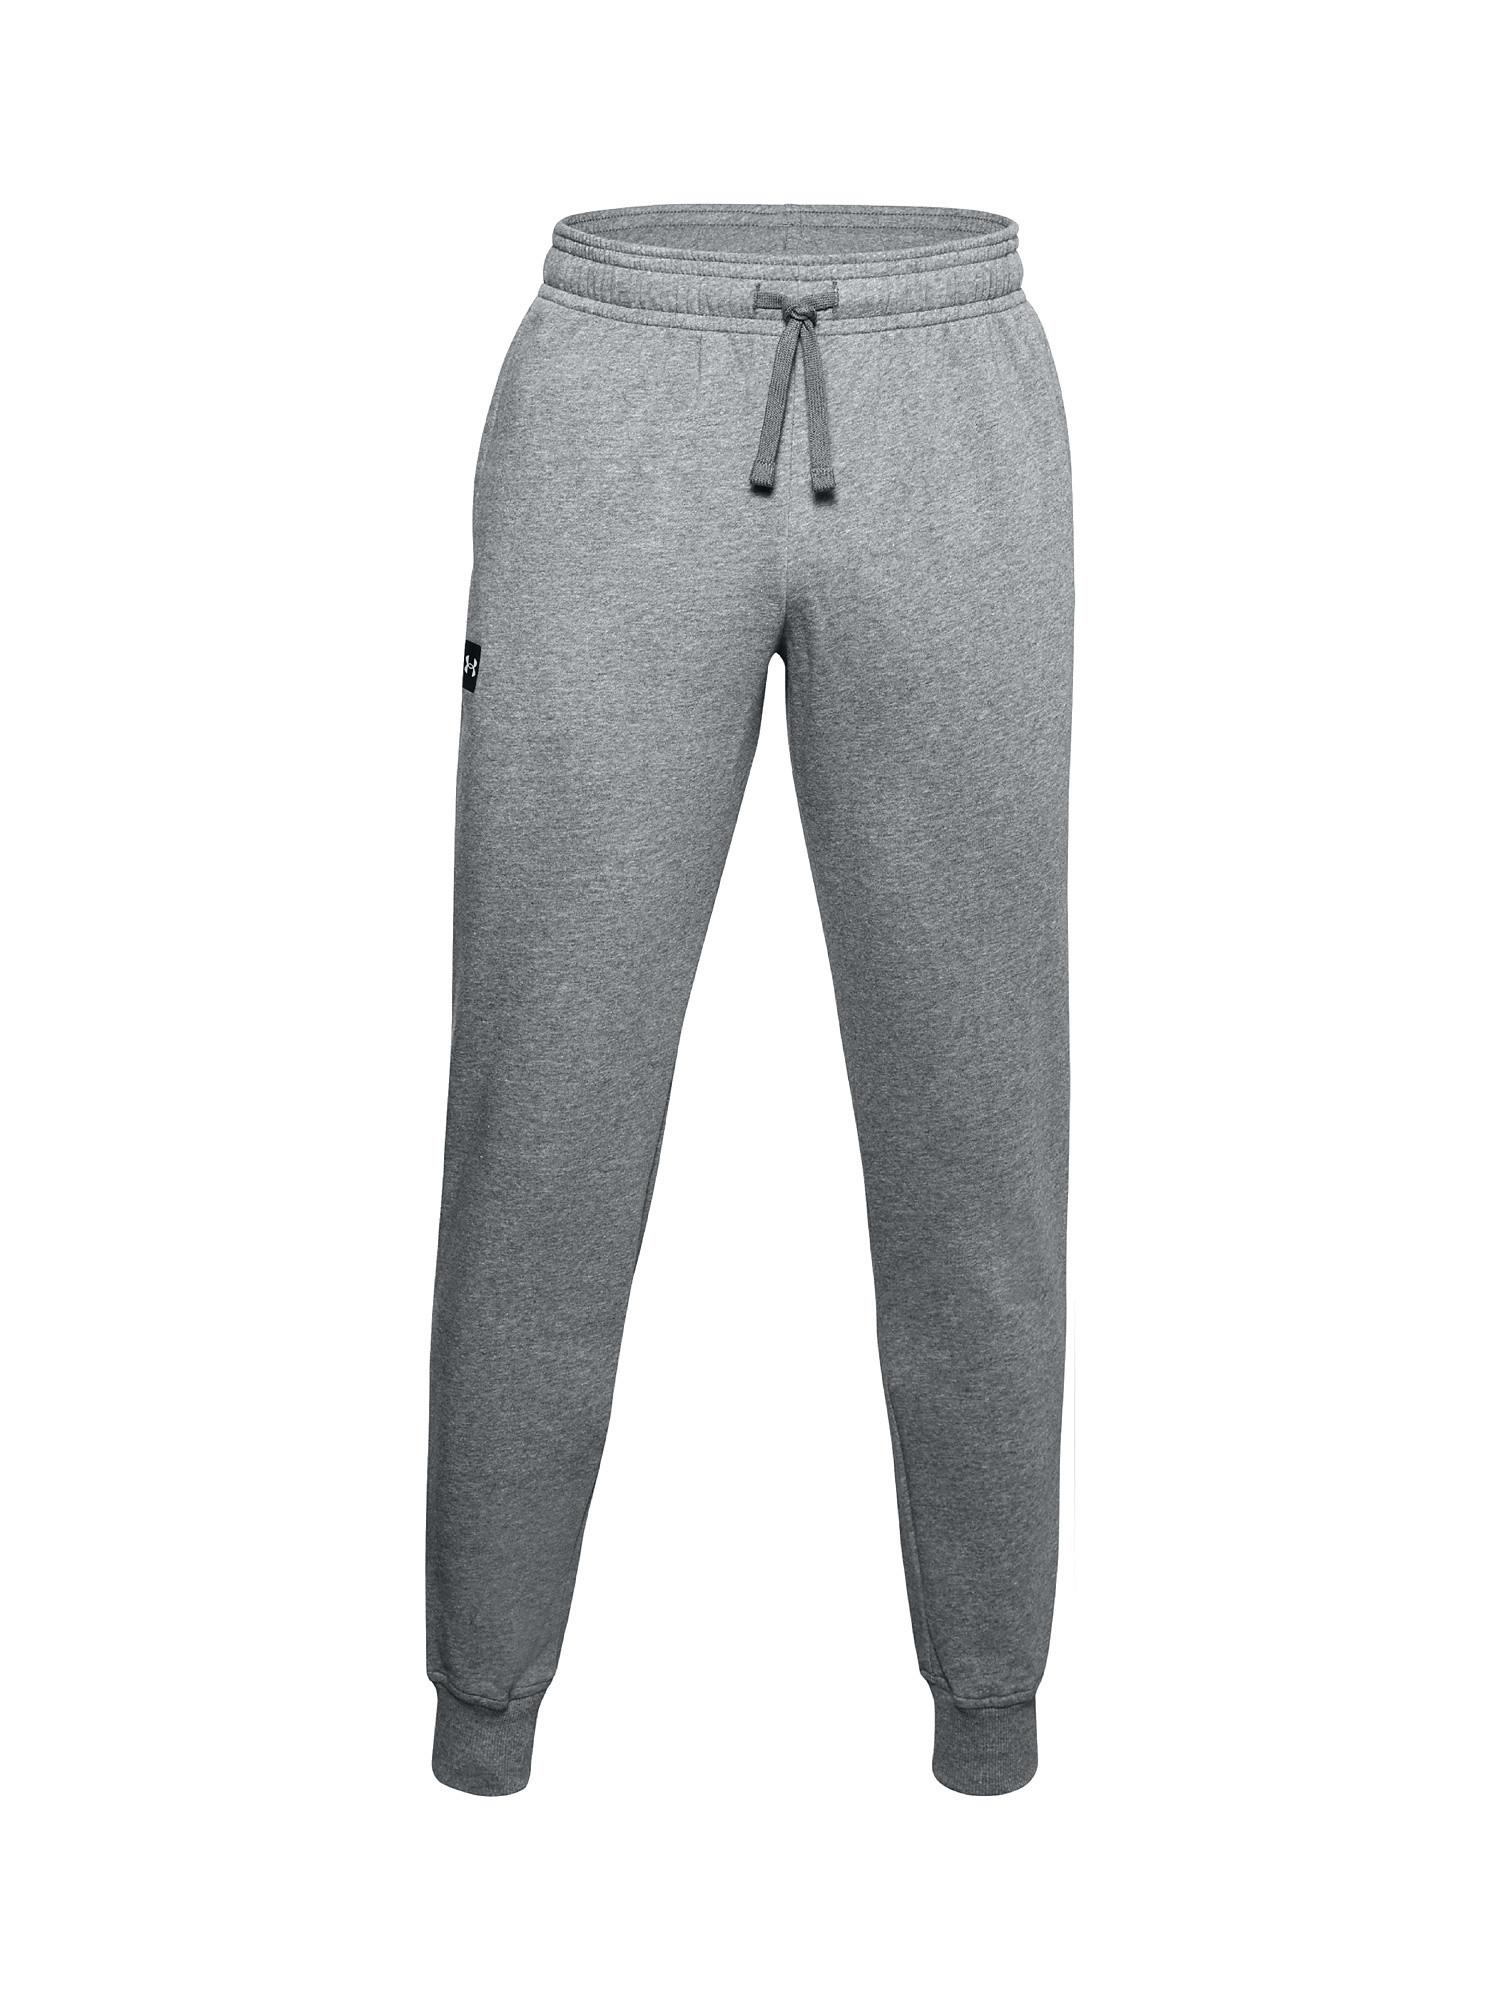 Pantaloni sportivi, Grigio, large image number 0